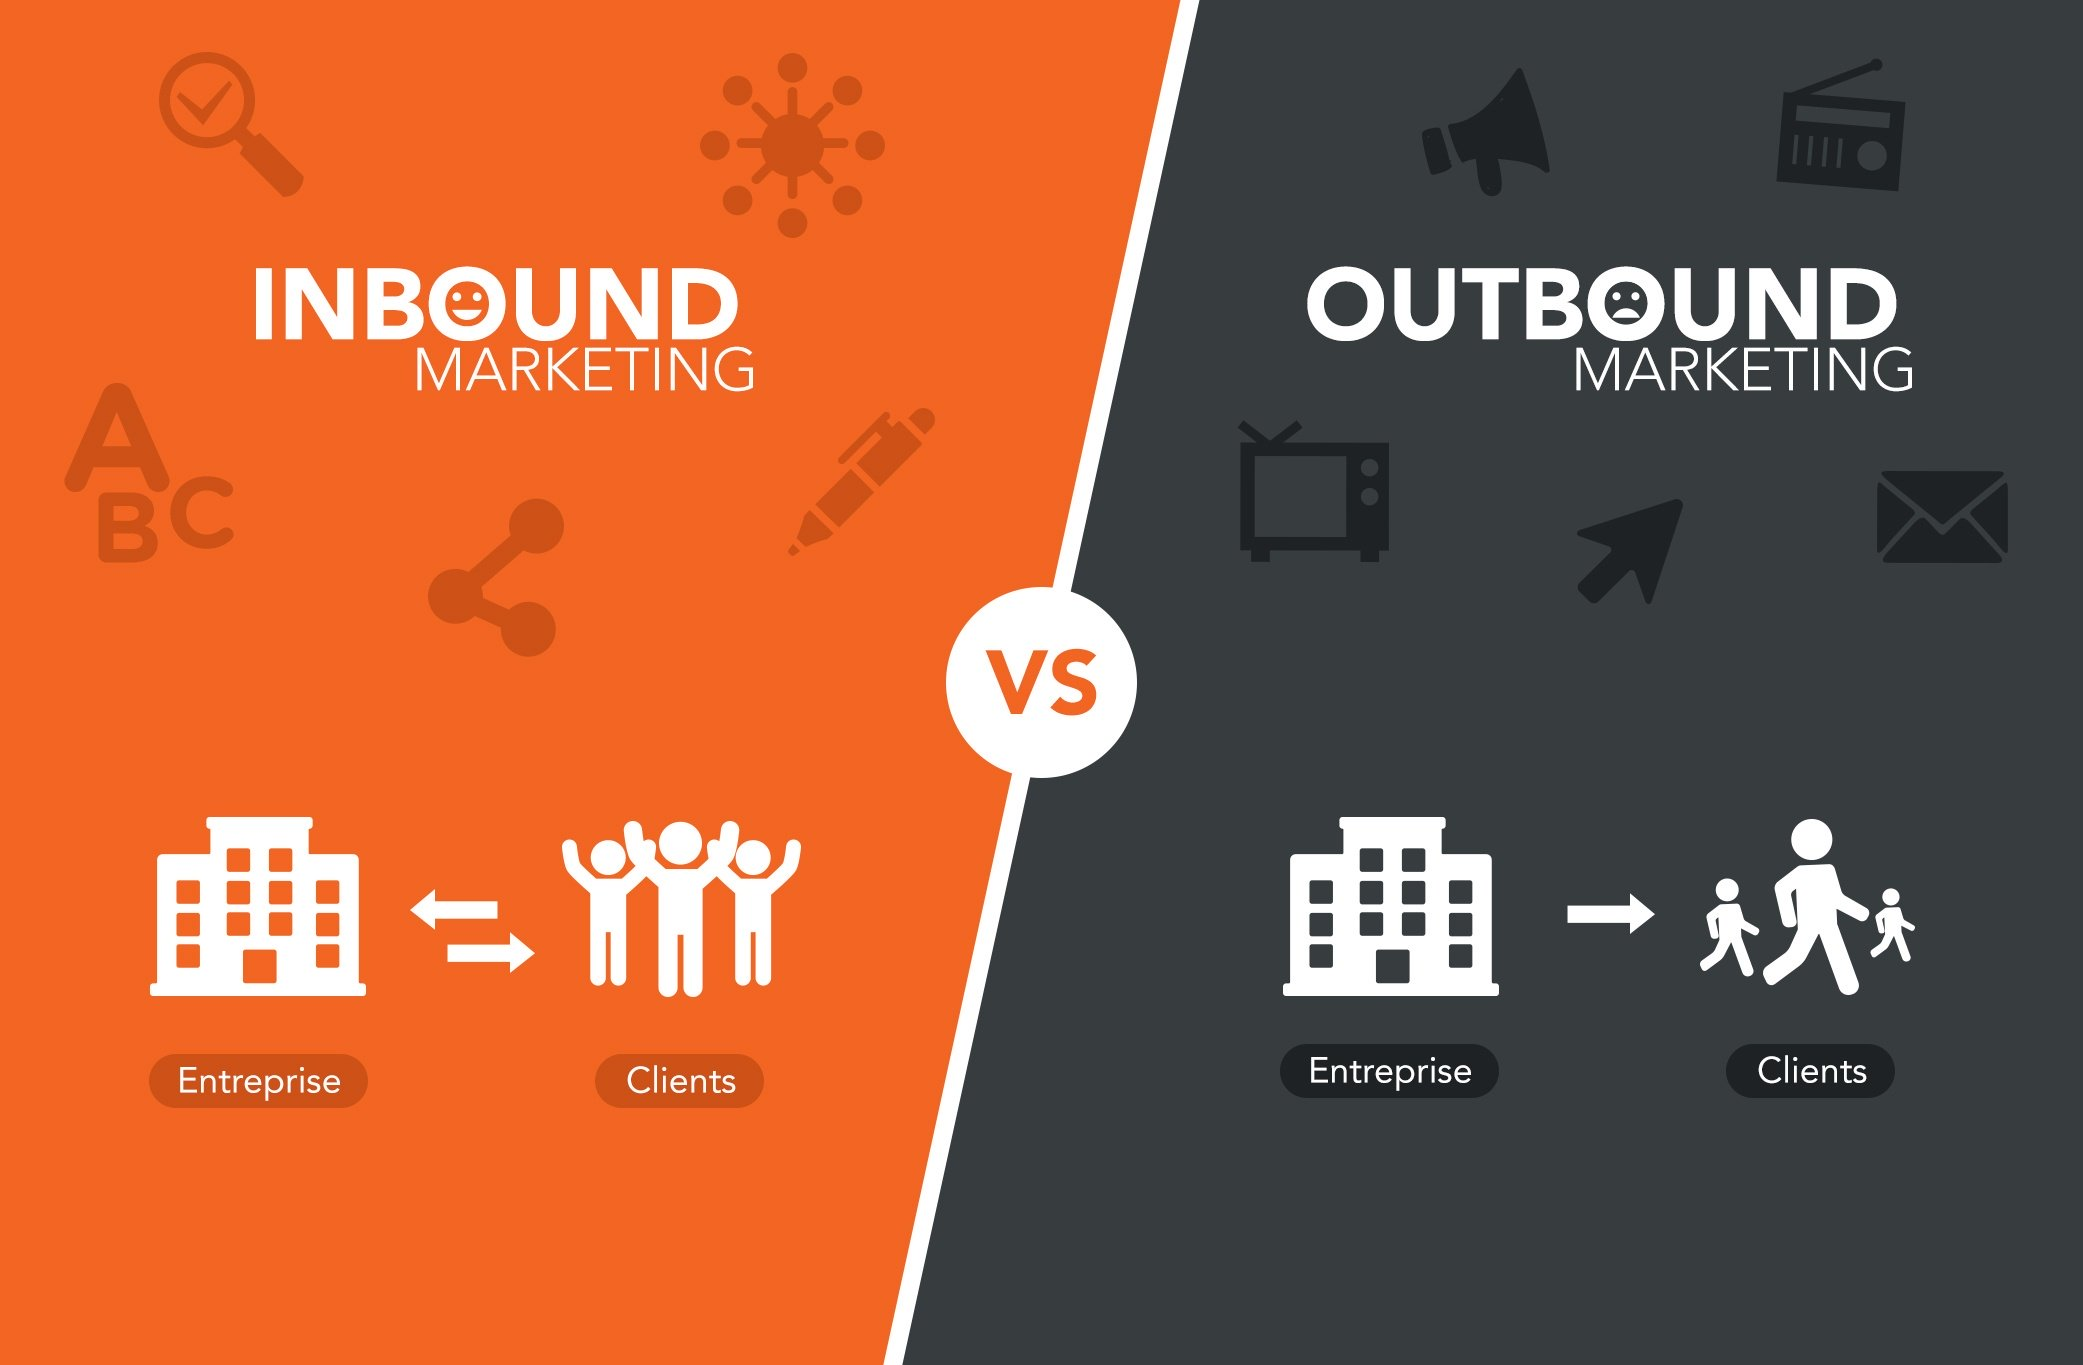 4 Outbound Marketing Best Practices